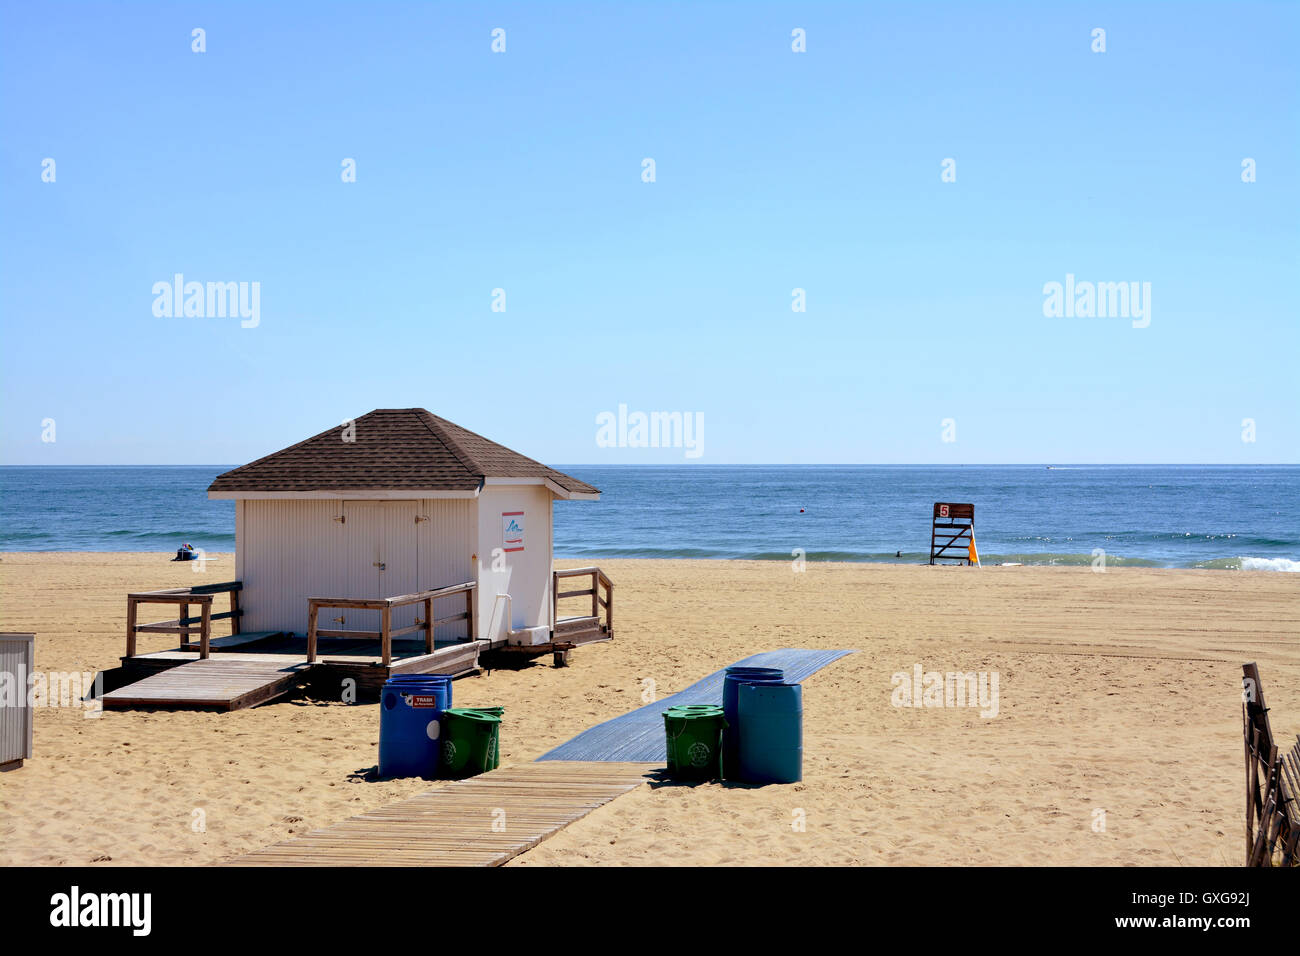 Beach Scape - Stock Image